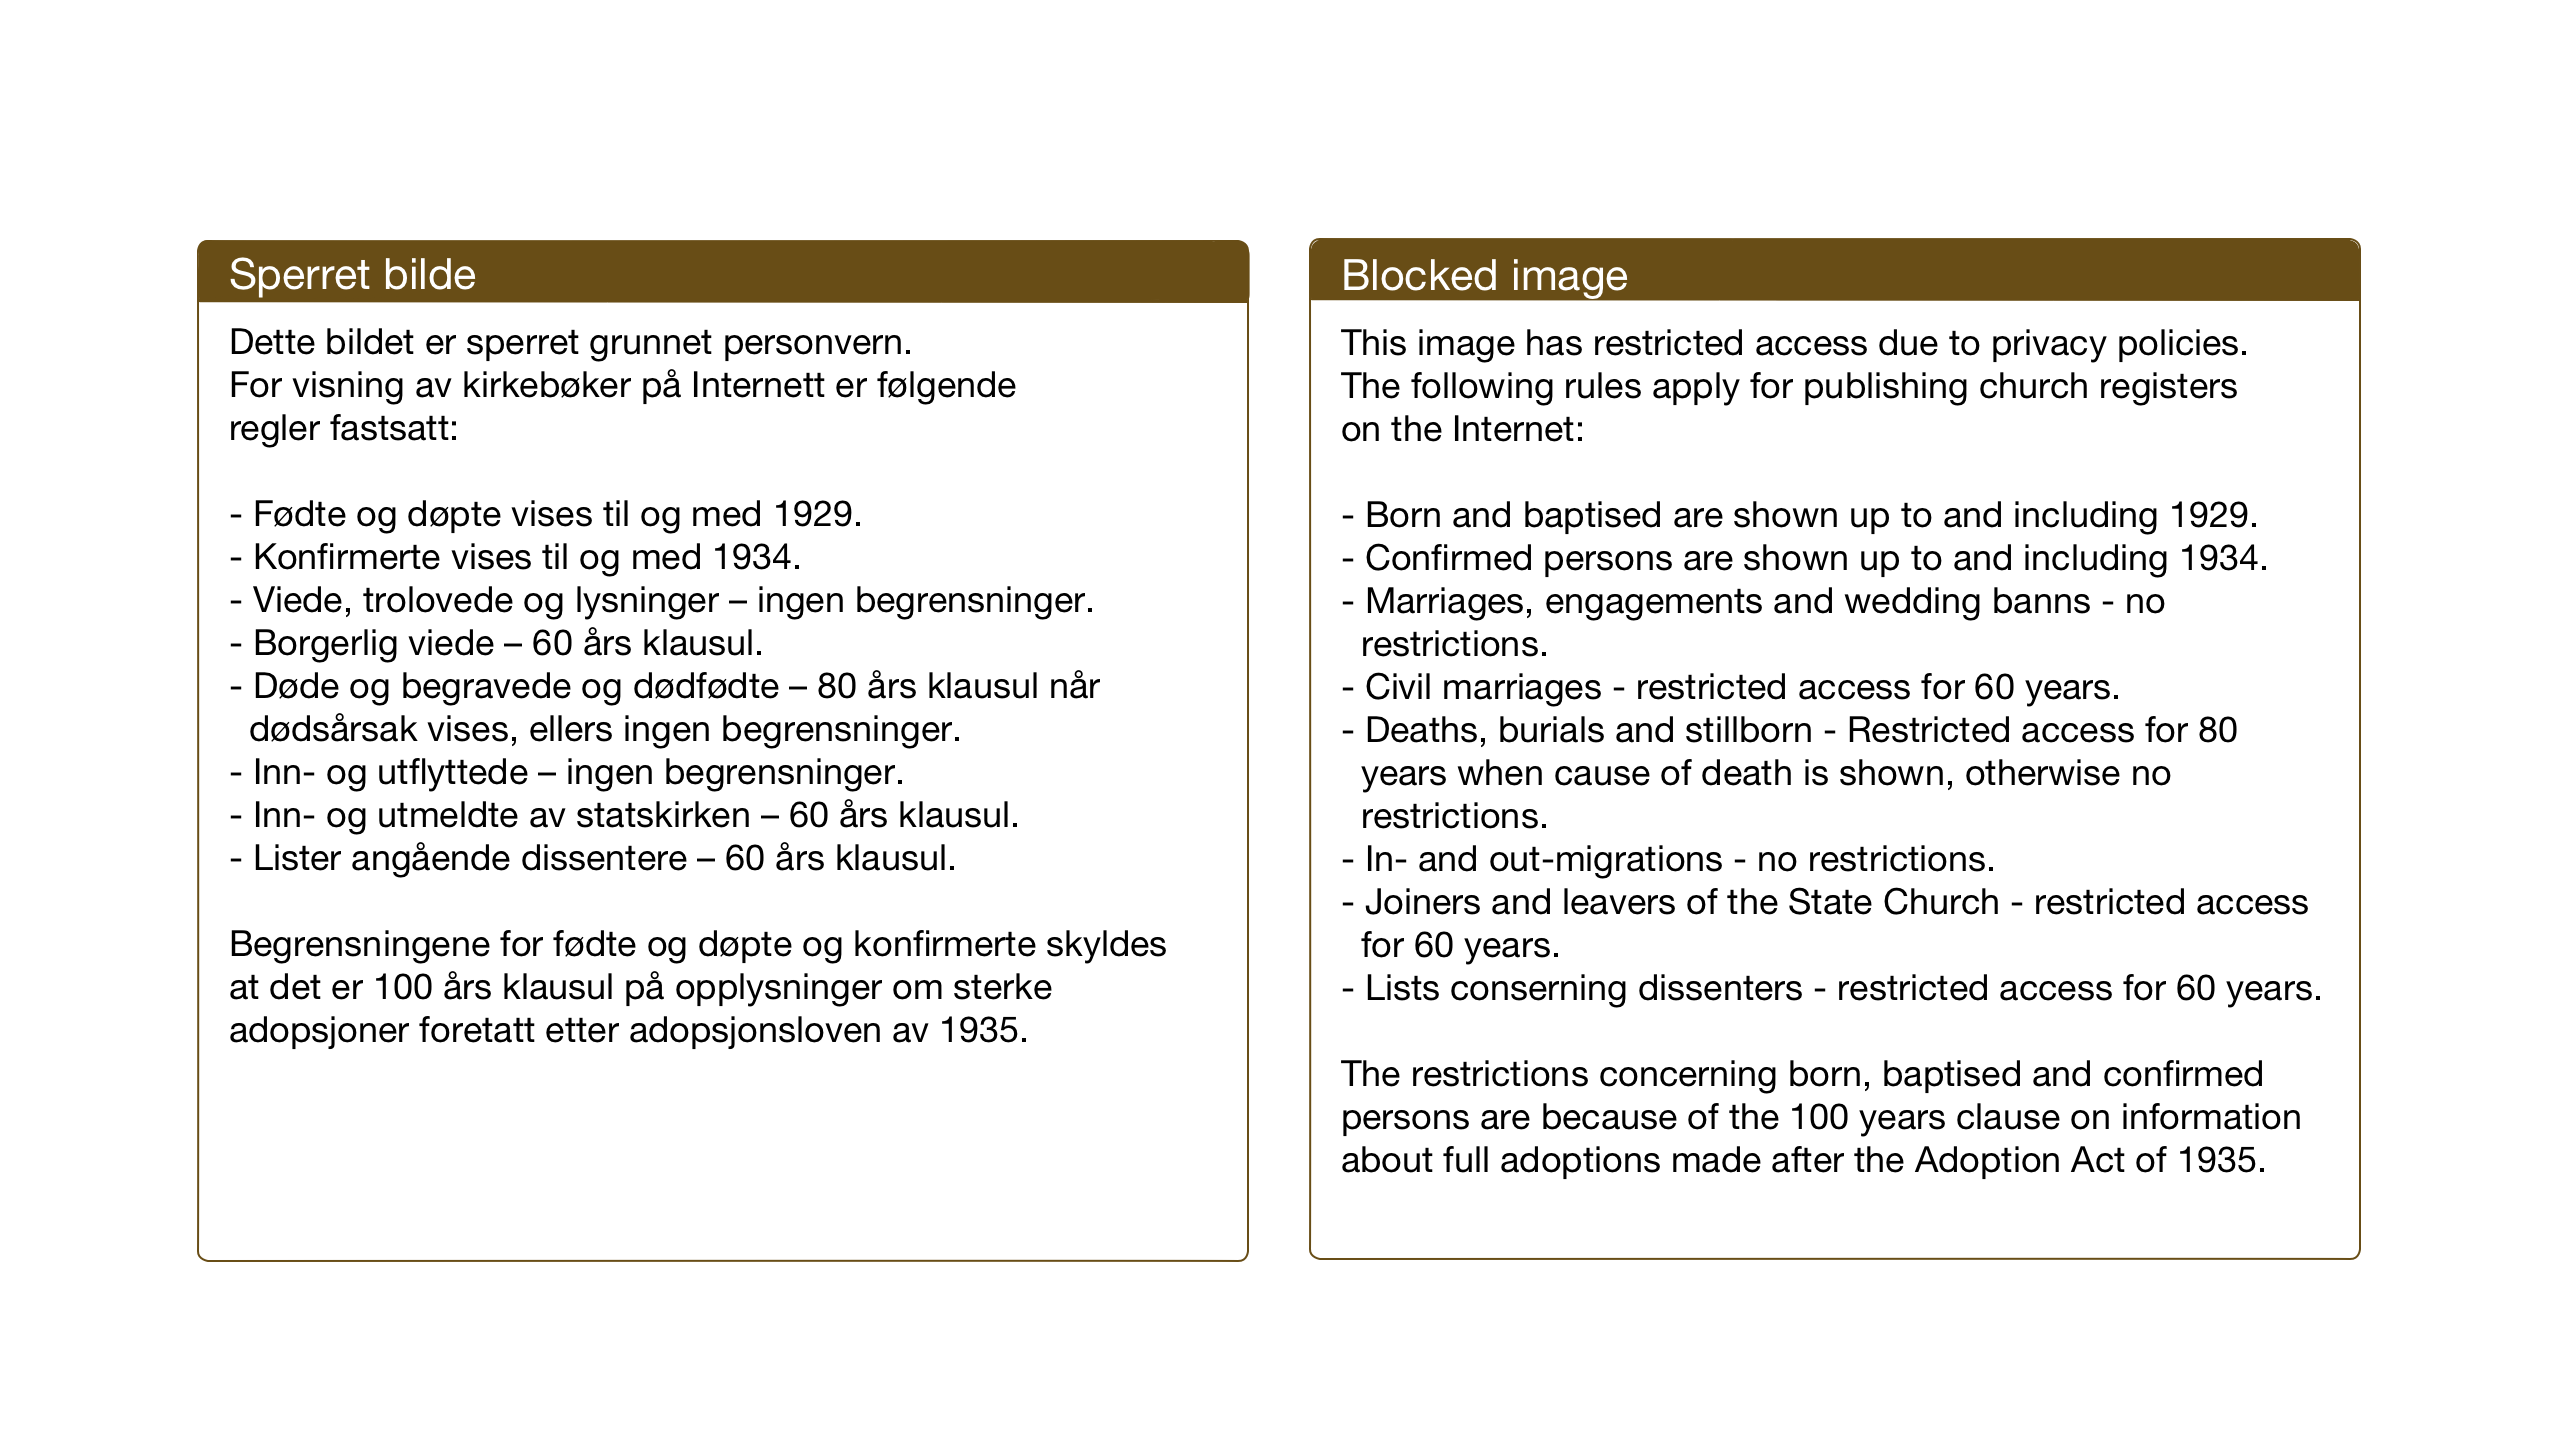 SAT, Ministerialprotokoller, klokkerbøker og fødselsregistre - Sør-Trøndelag, 653/L0658: Parish register (copy) no. 653C02, 1919-1947, p. 224